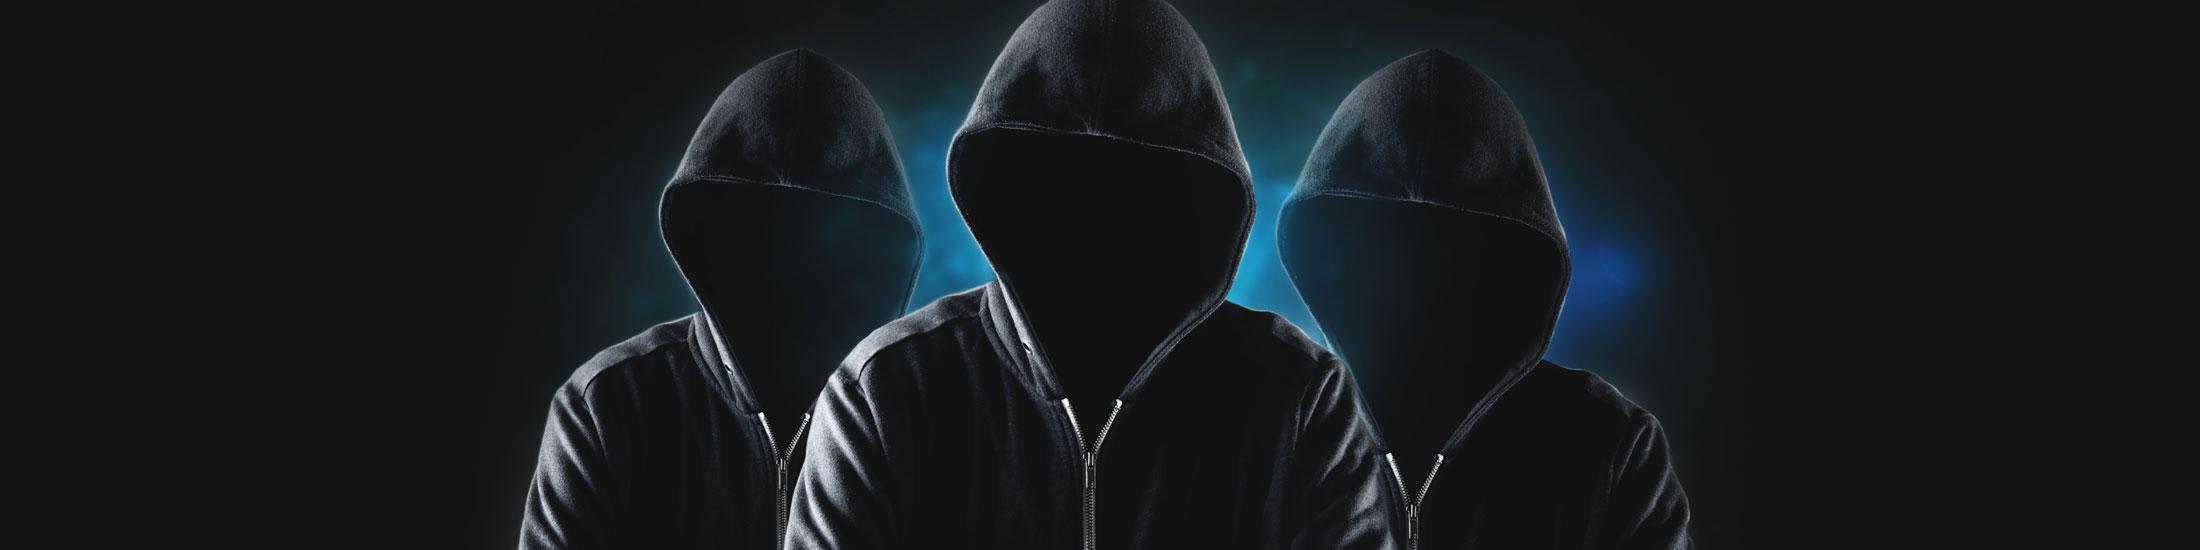 Report: Top 3 Fraud Threats Facing Merchants